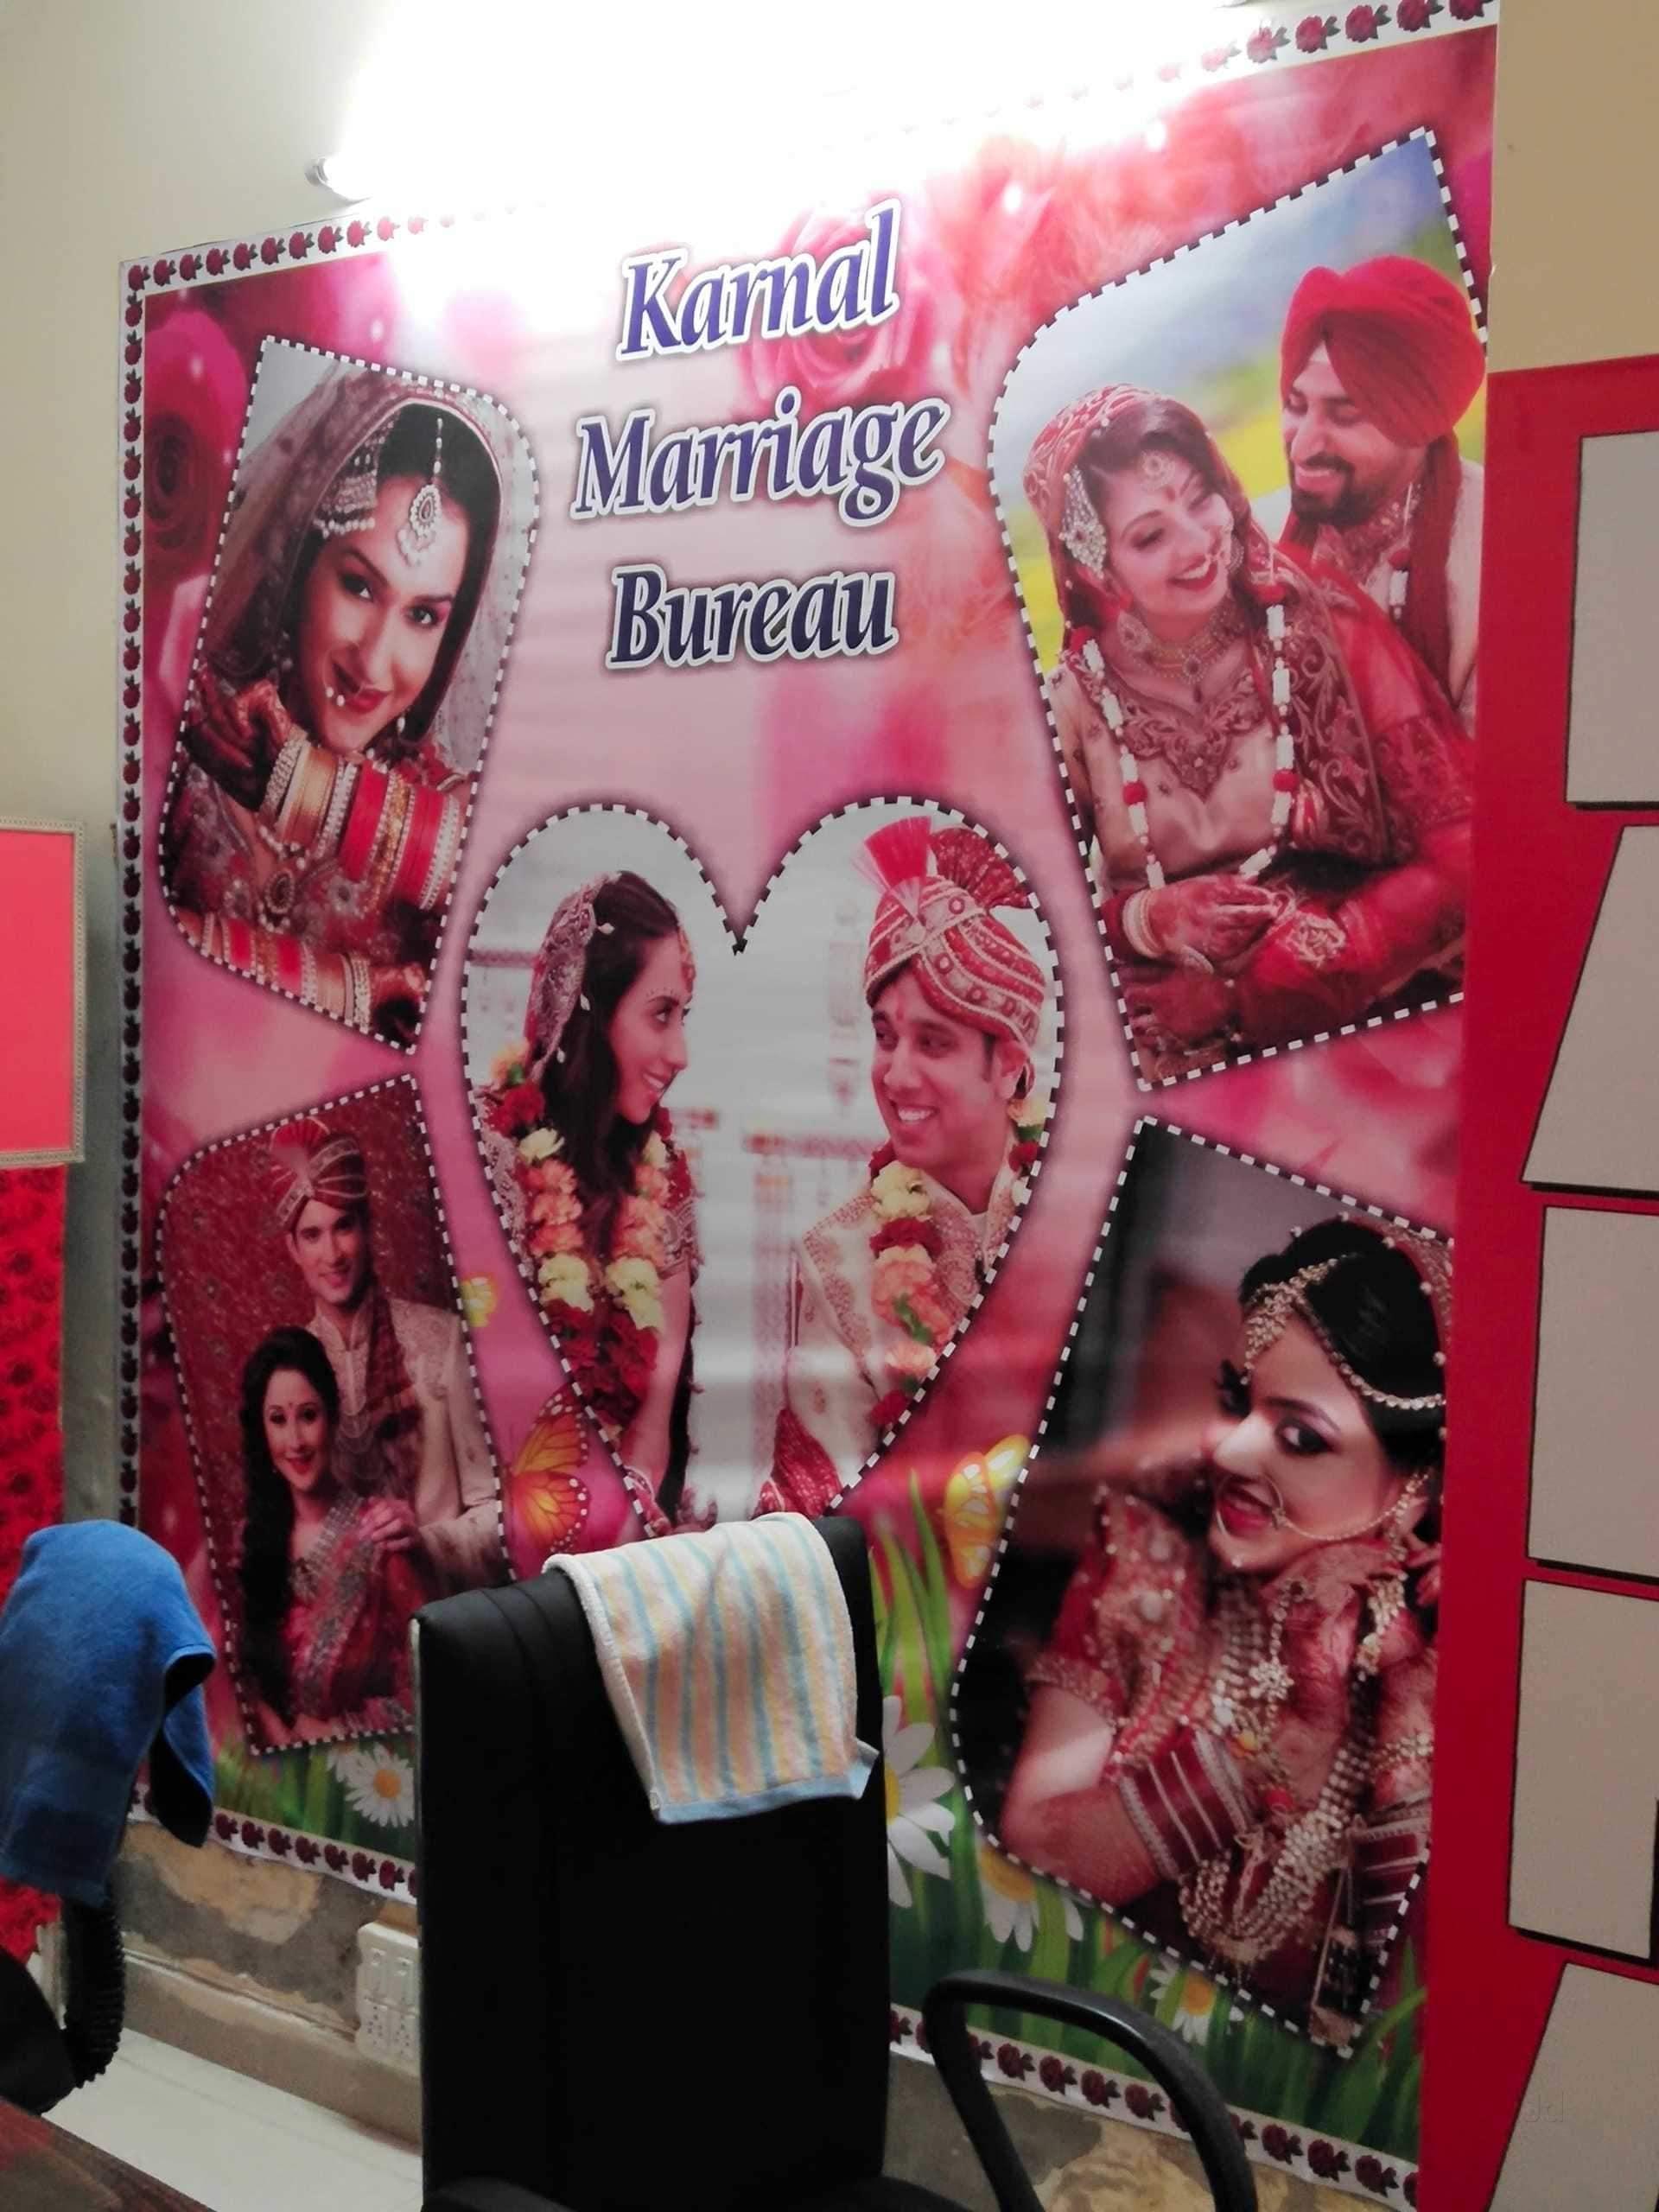 Top 30 Marriage Bureau in Karnal - Best Tamil Matrimony - Justdial